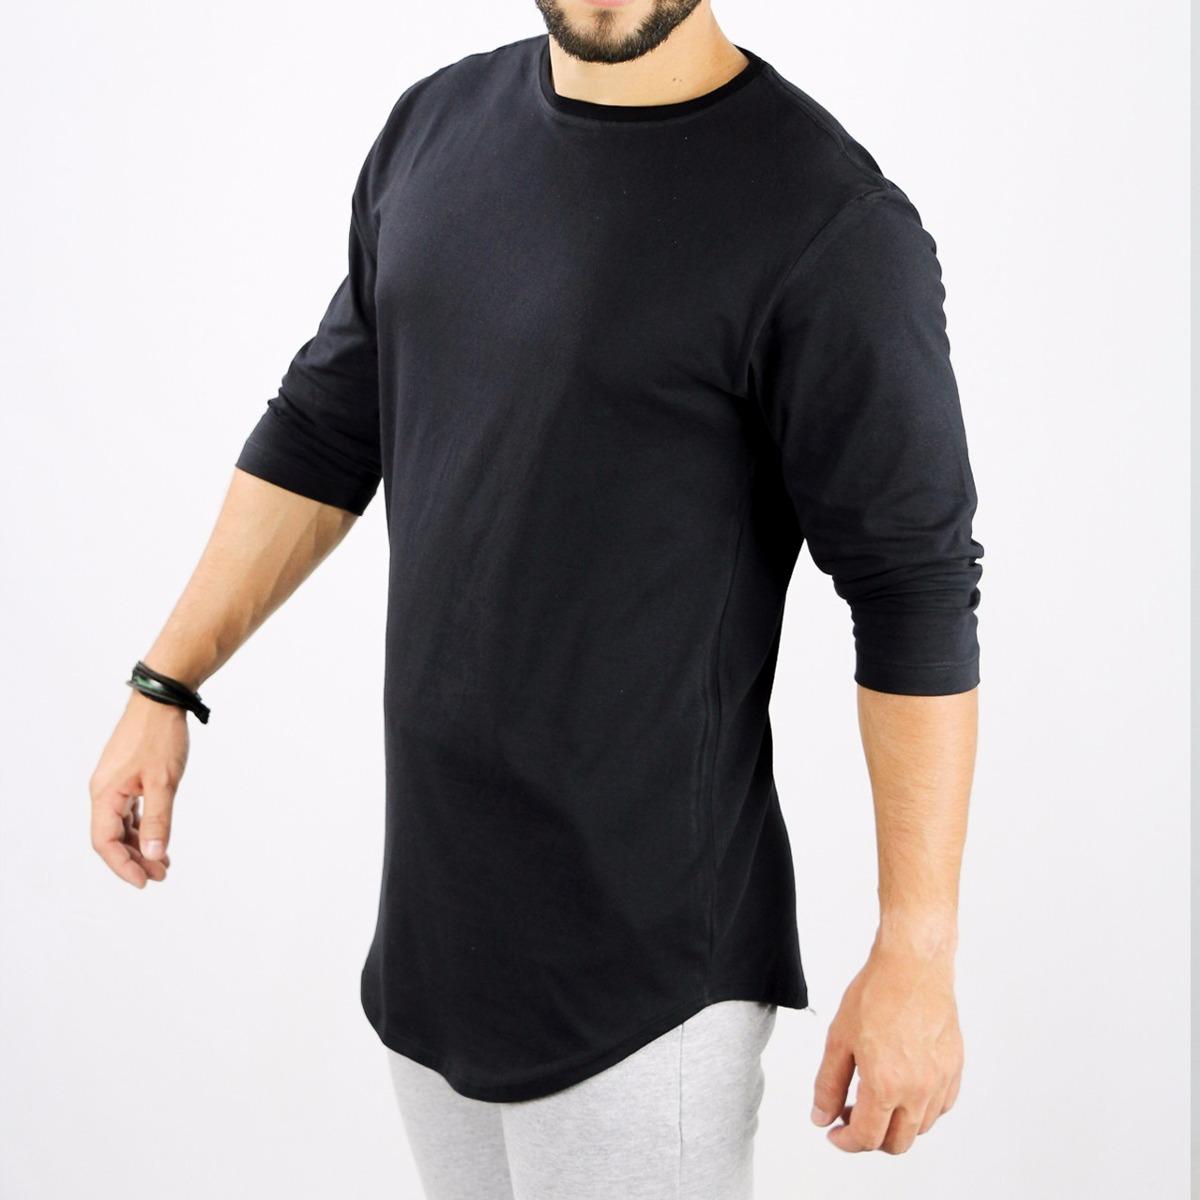 caabed632 camiseta oversized longline redonda swag manga 3 4 algodão. Carregando zoom.